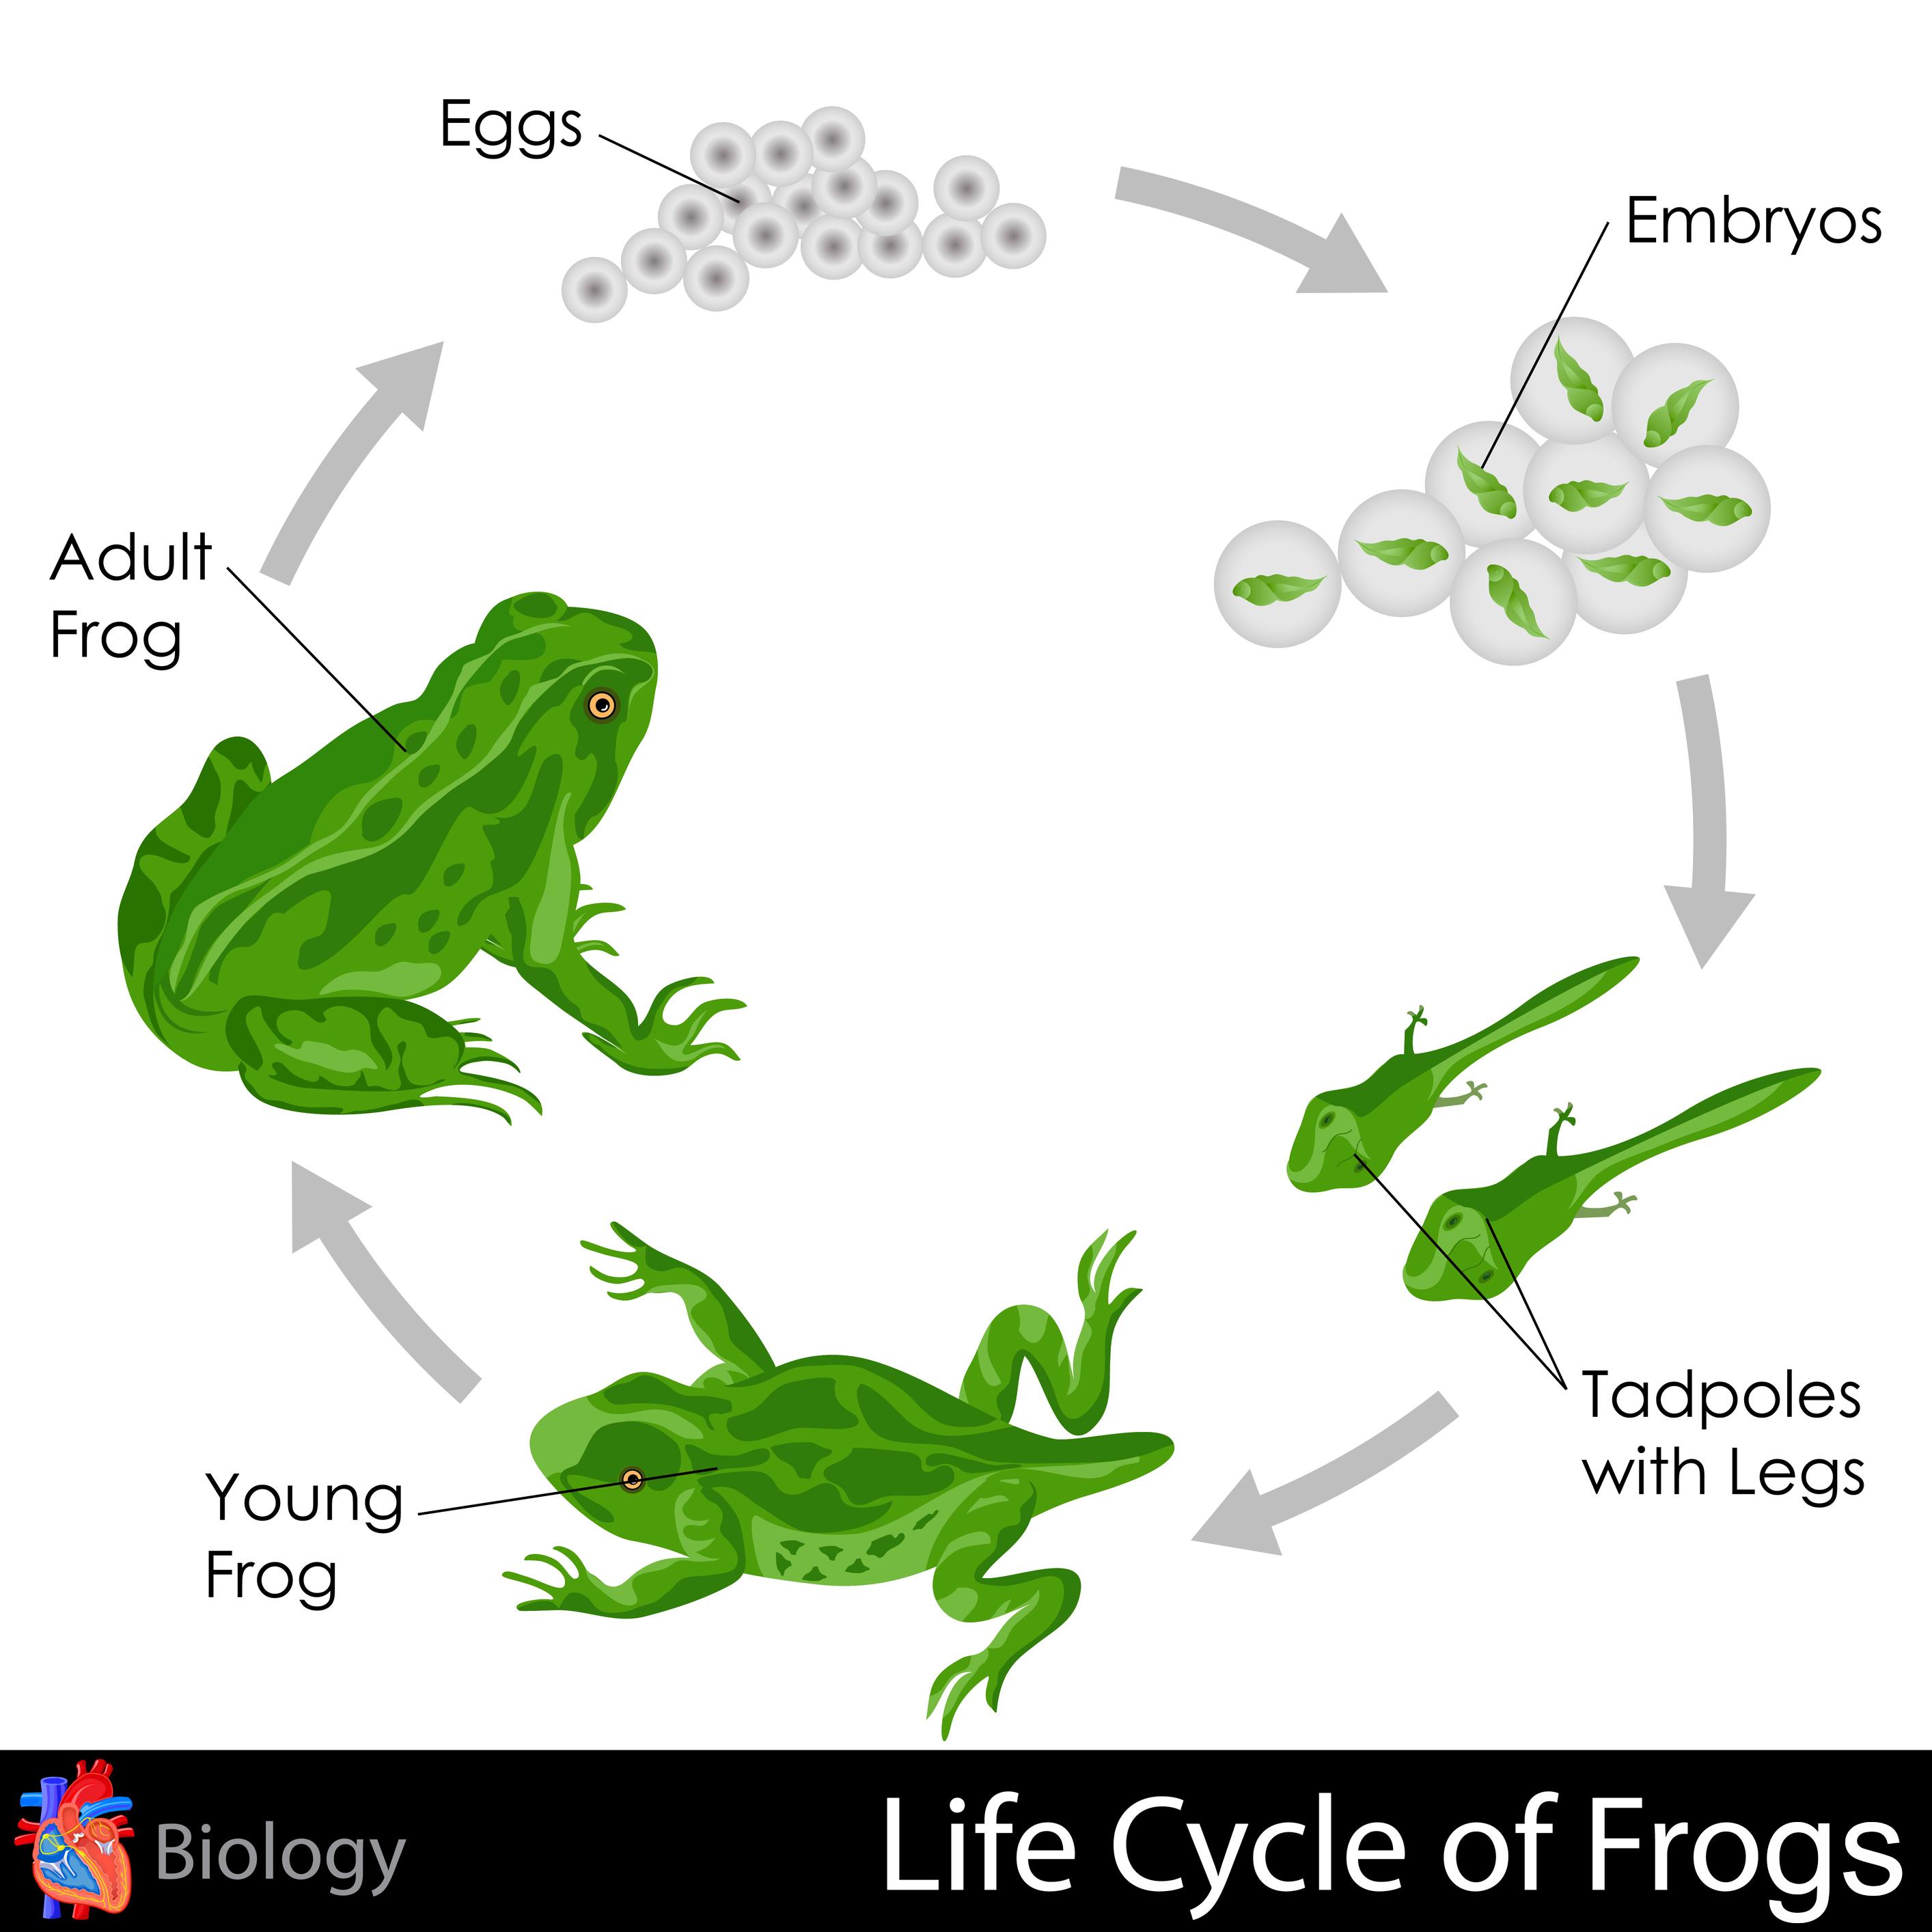 Worksheet Life Cycle Of A Frog Worksheet Grass Fedjp